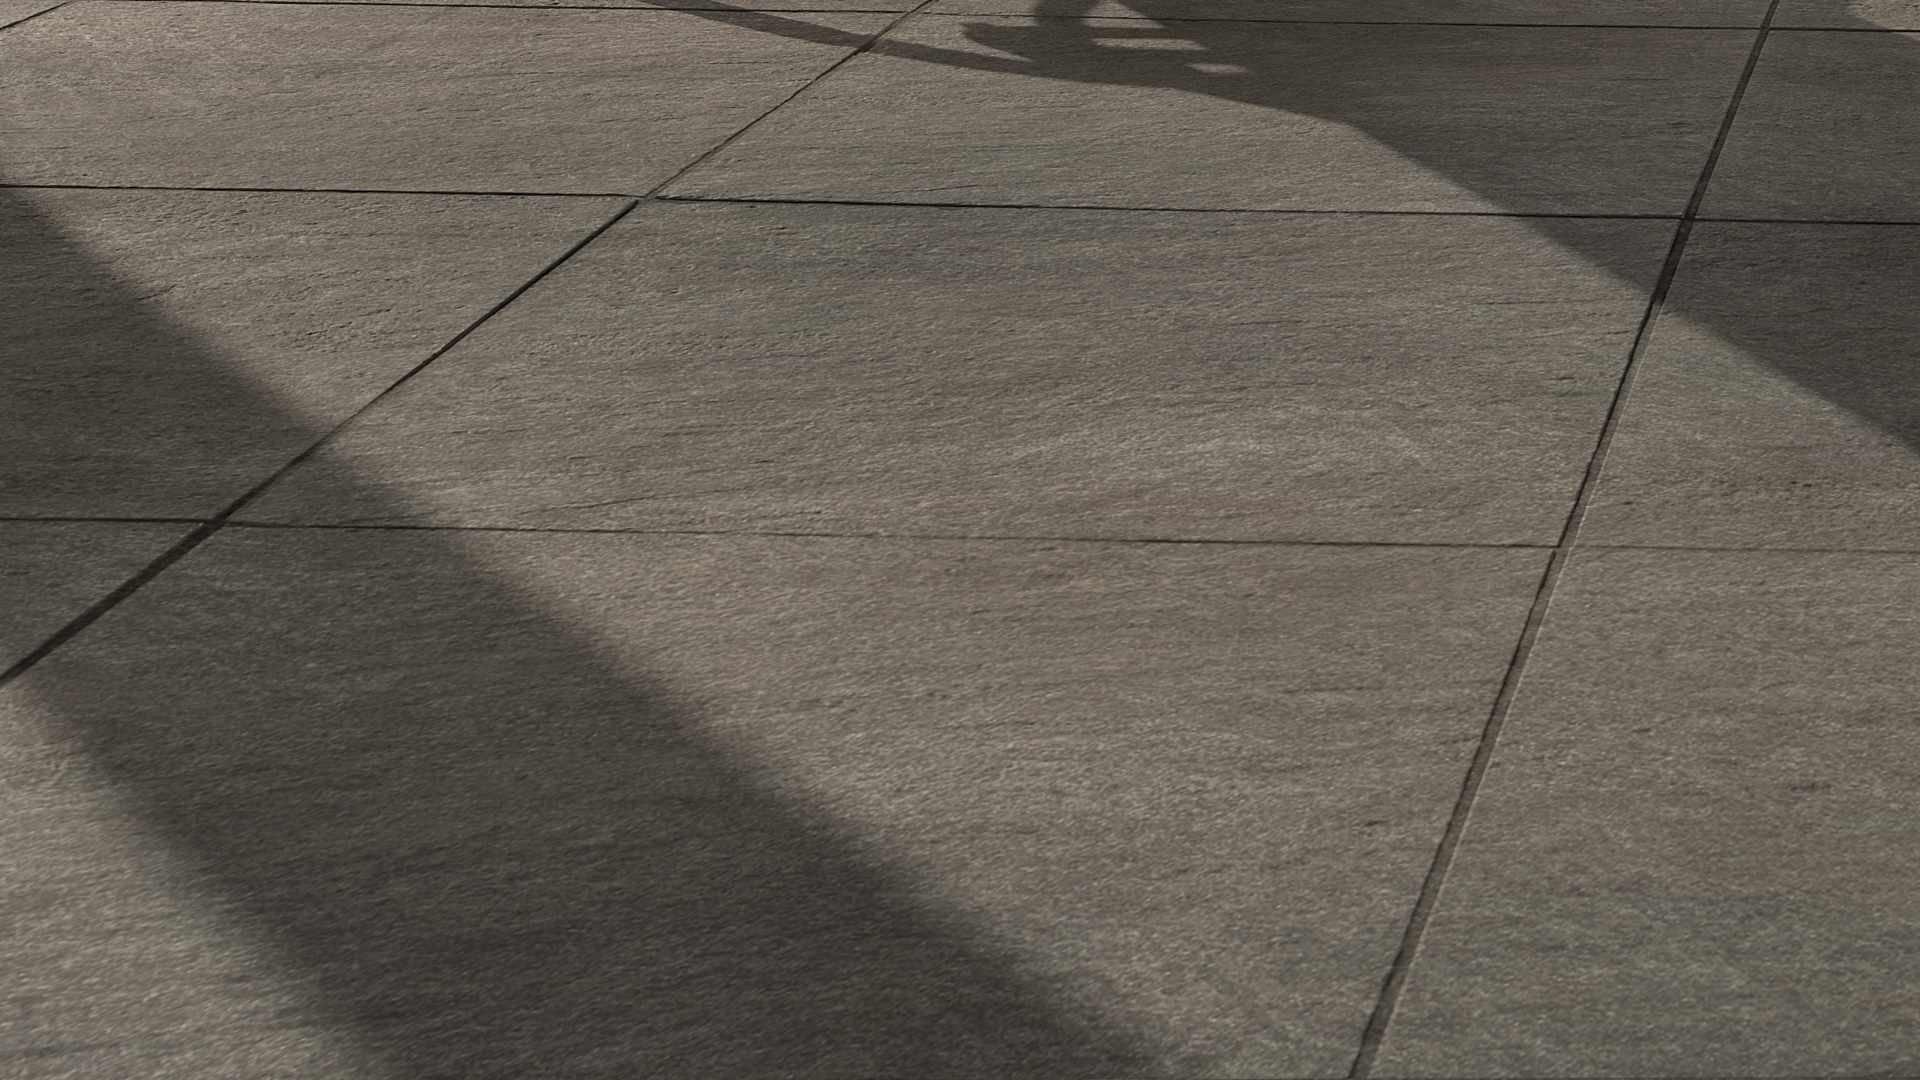 Terrassenplatten aus Keramik (Feinsteinzeug)